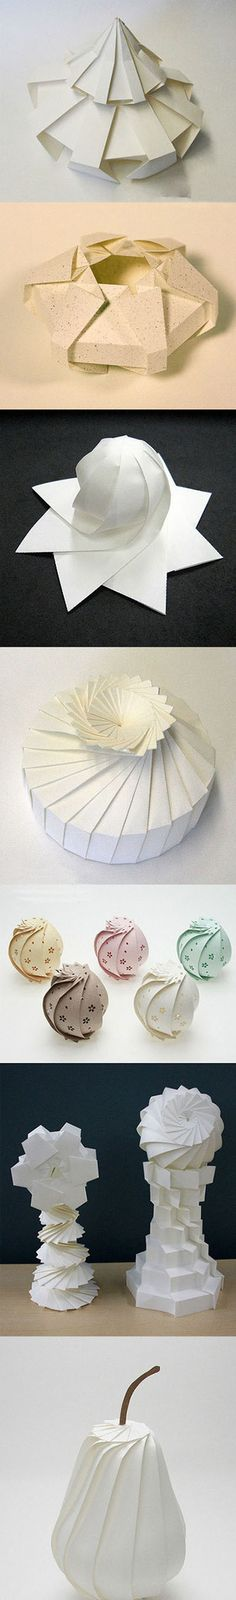 Beautiful Paper Crafts | DIY  Crafts Tutorials